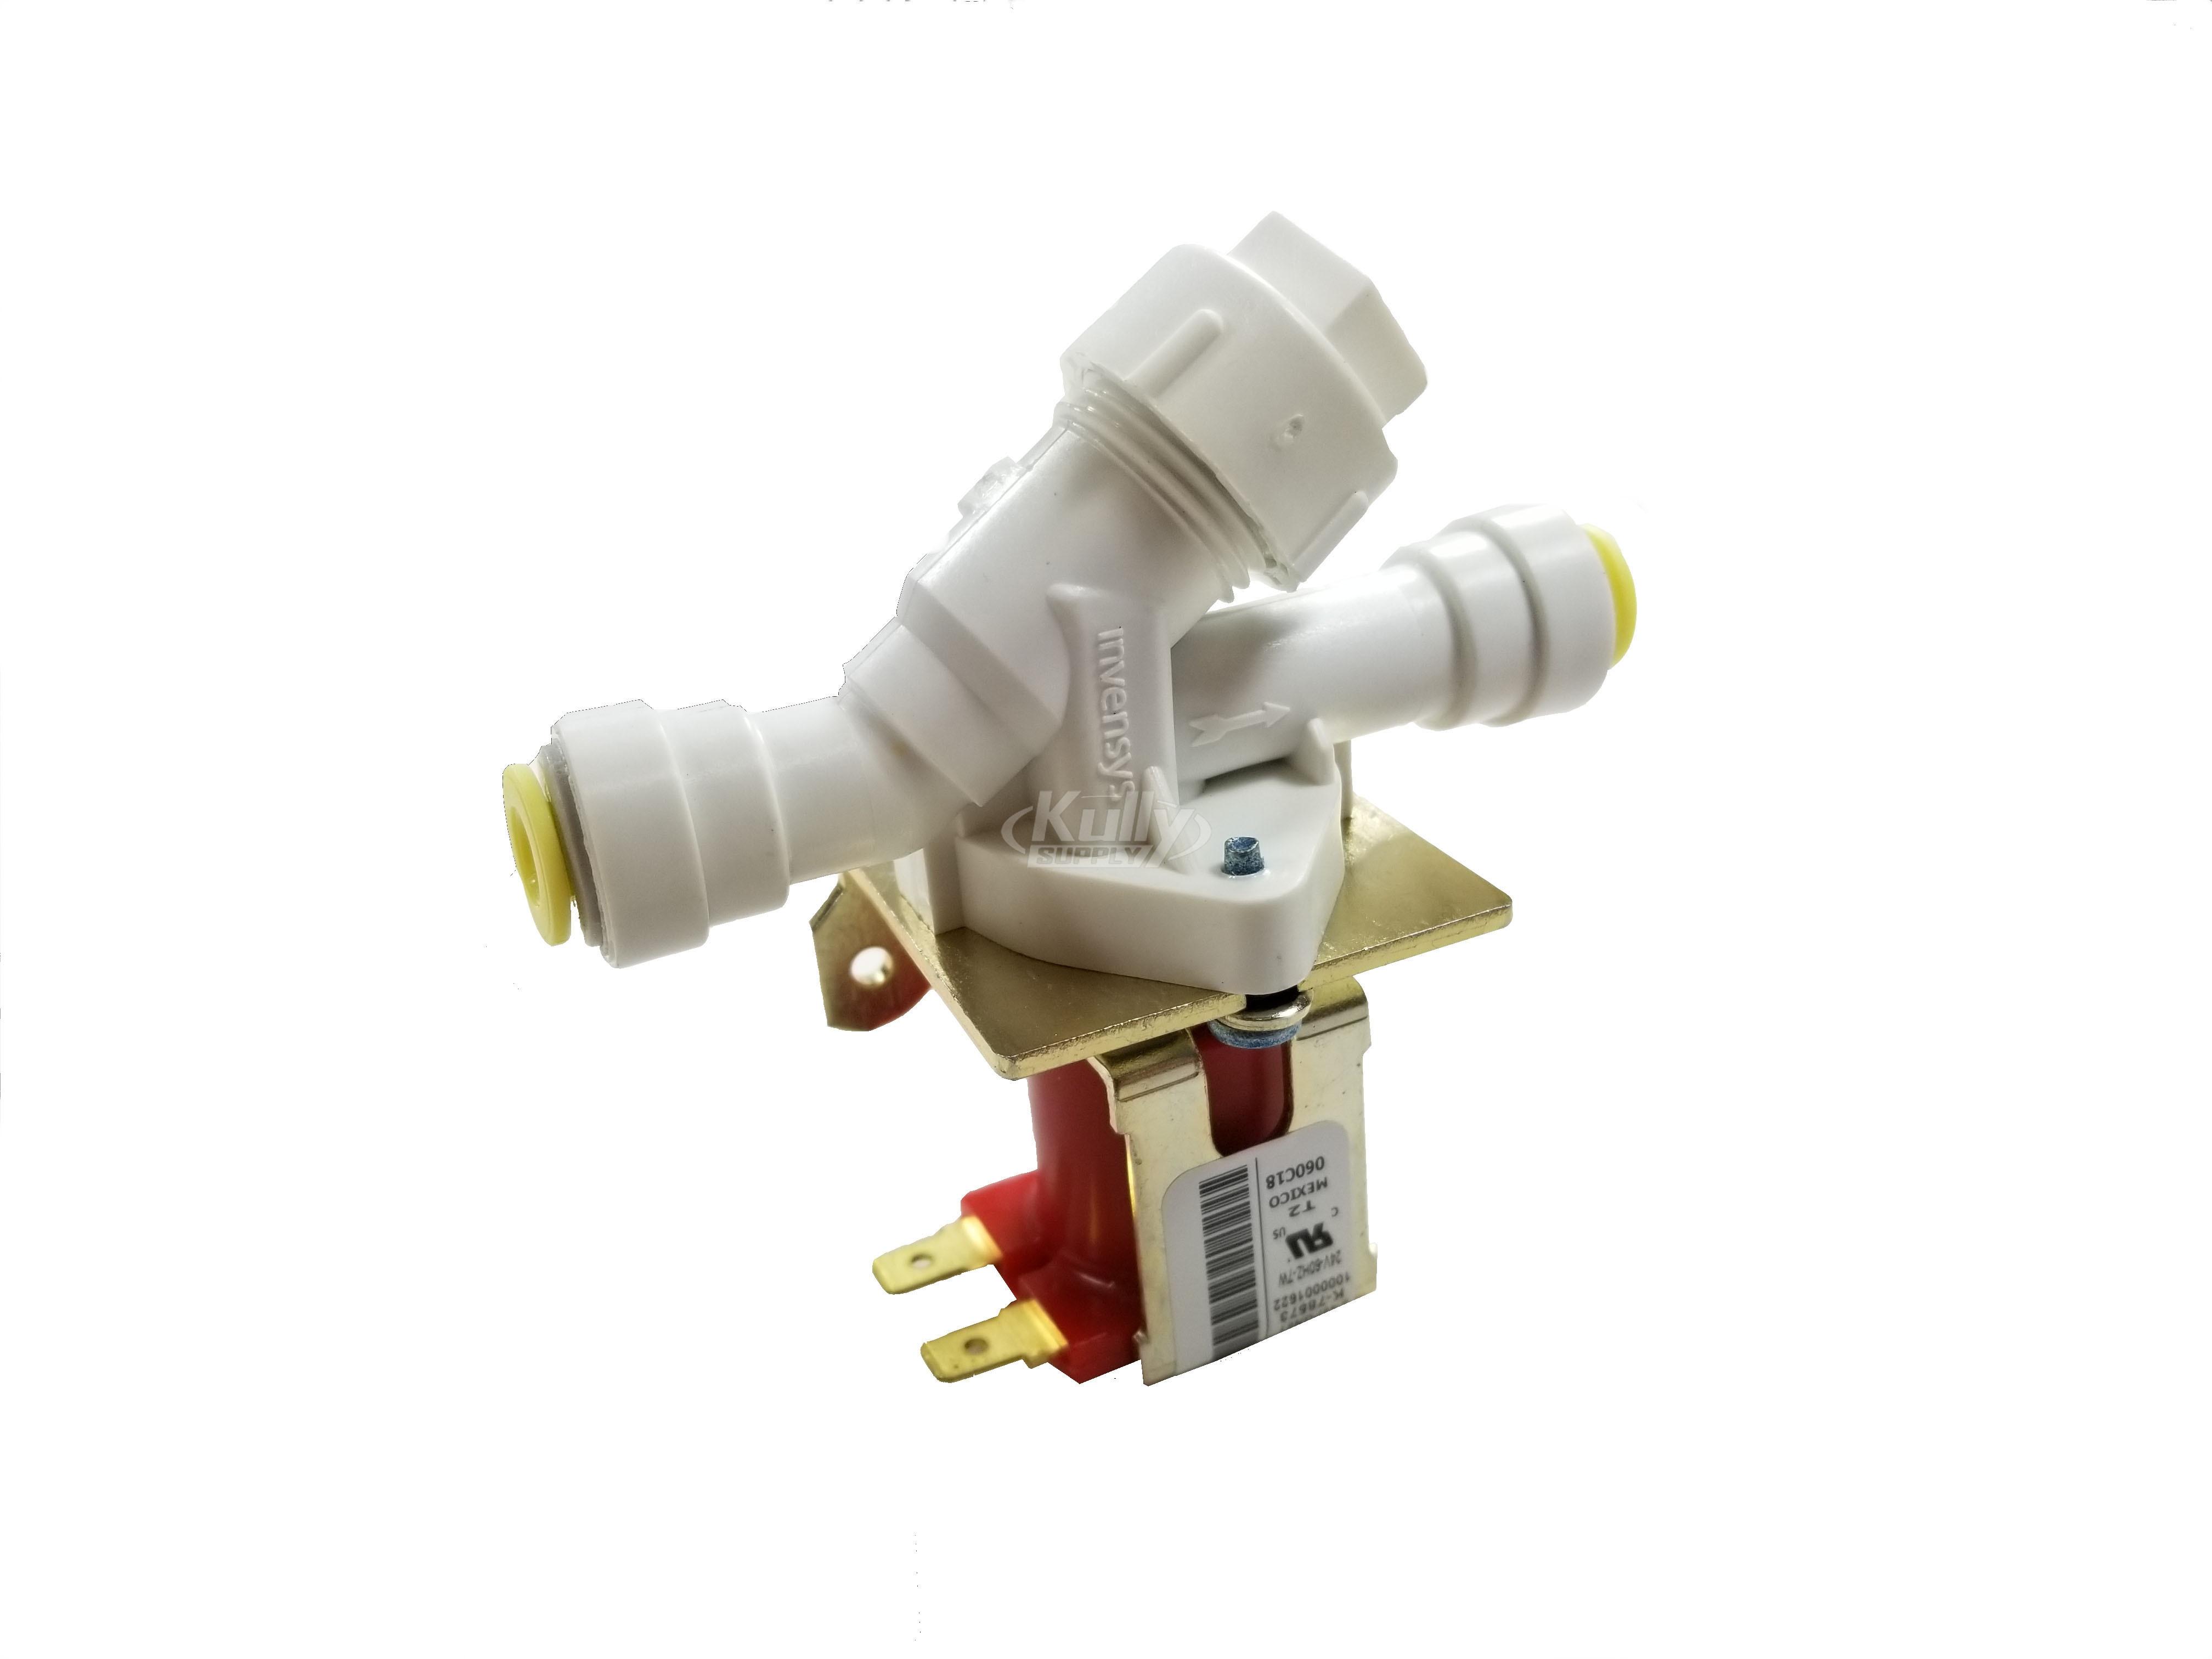 Elkay 1000001622 Solenoid Valve for Enhanced Bottle Filling Station